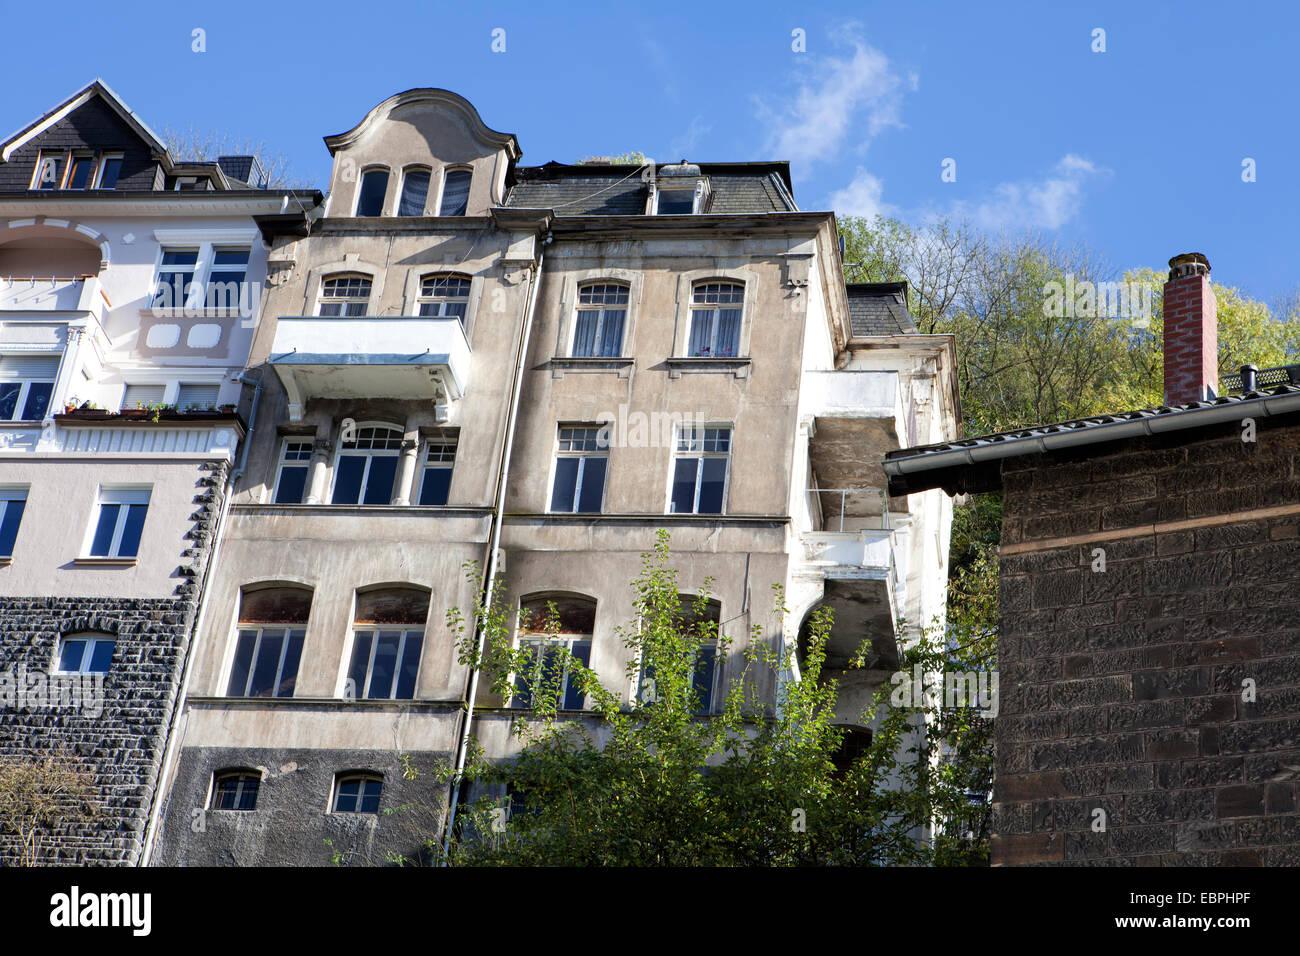 Edificio residenziale, Altena, Lennetal, Maerkischer Kreis, Sauerland, Renania settentrionale-Vestfalia, Germania, Immagini Stock